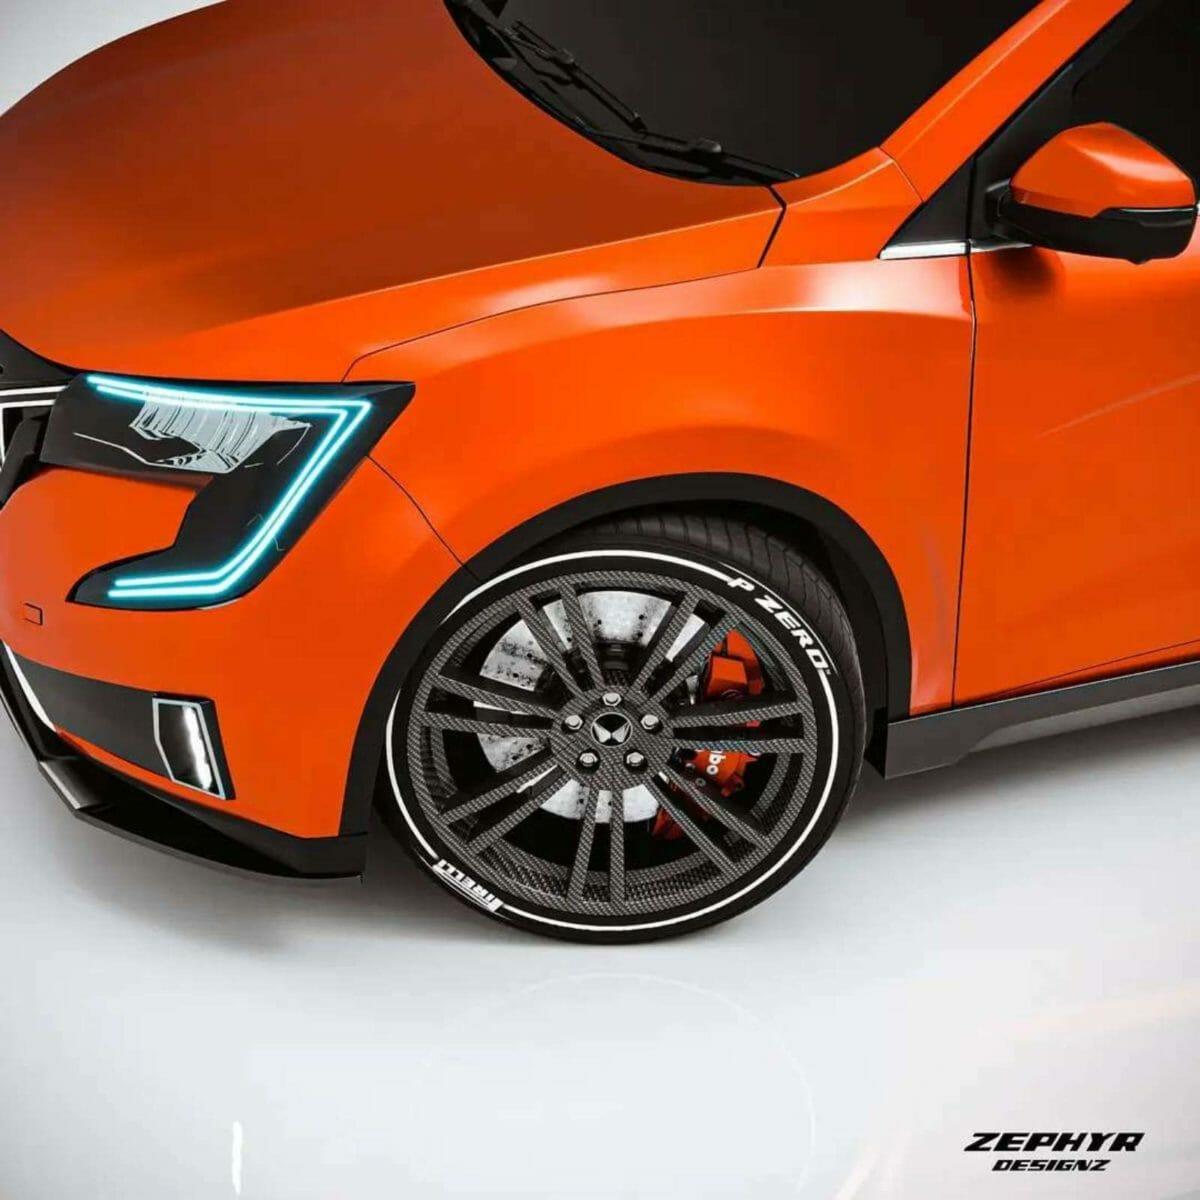 mahindra xuv700 sports edition render wheels